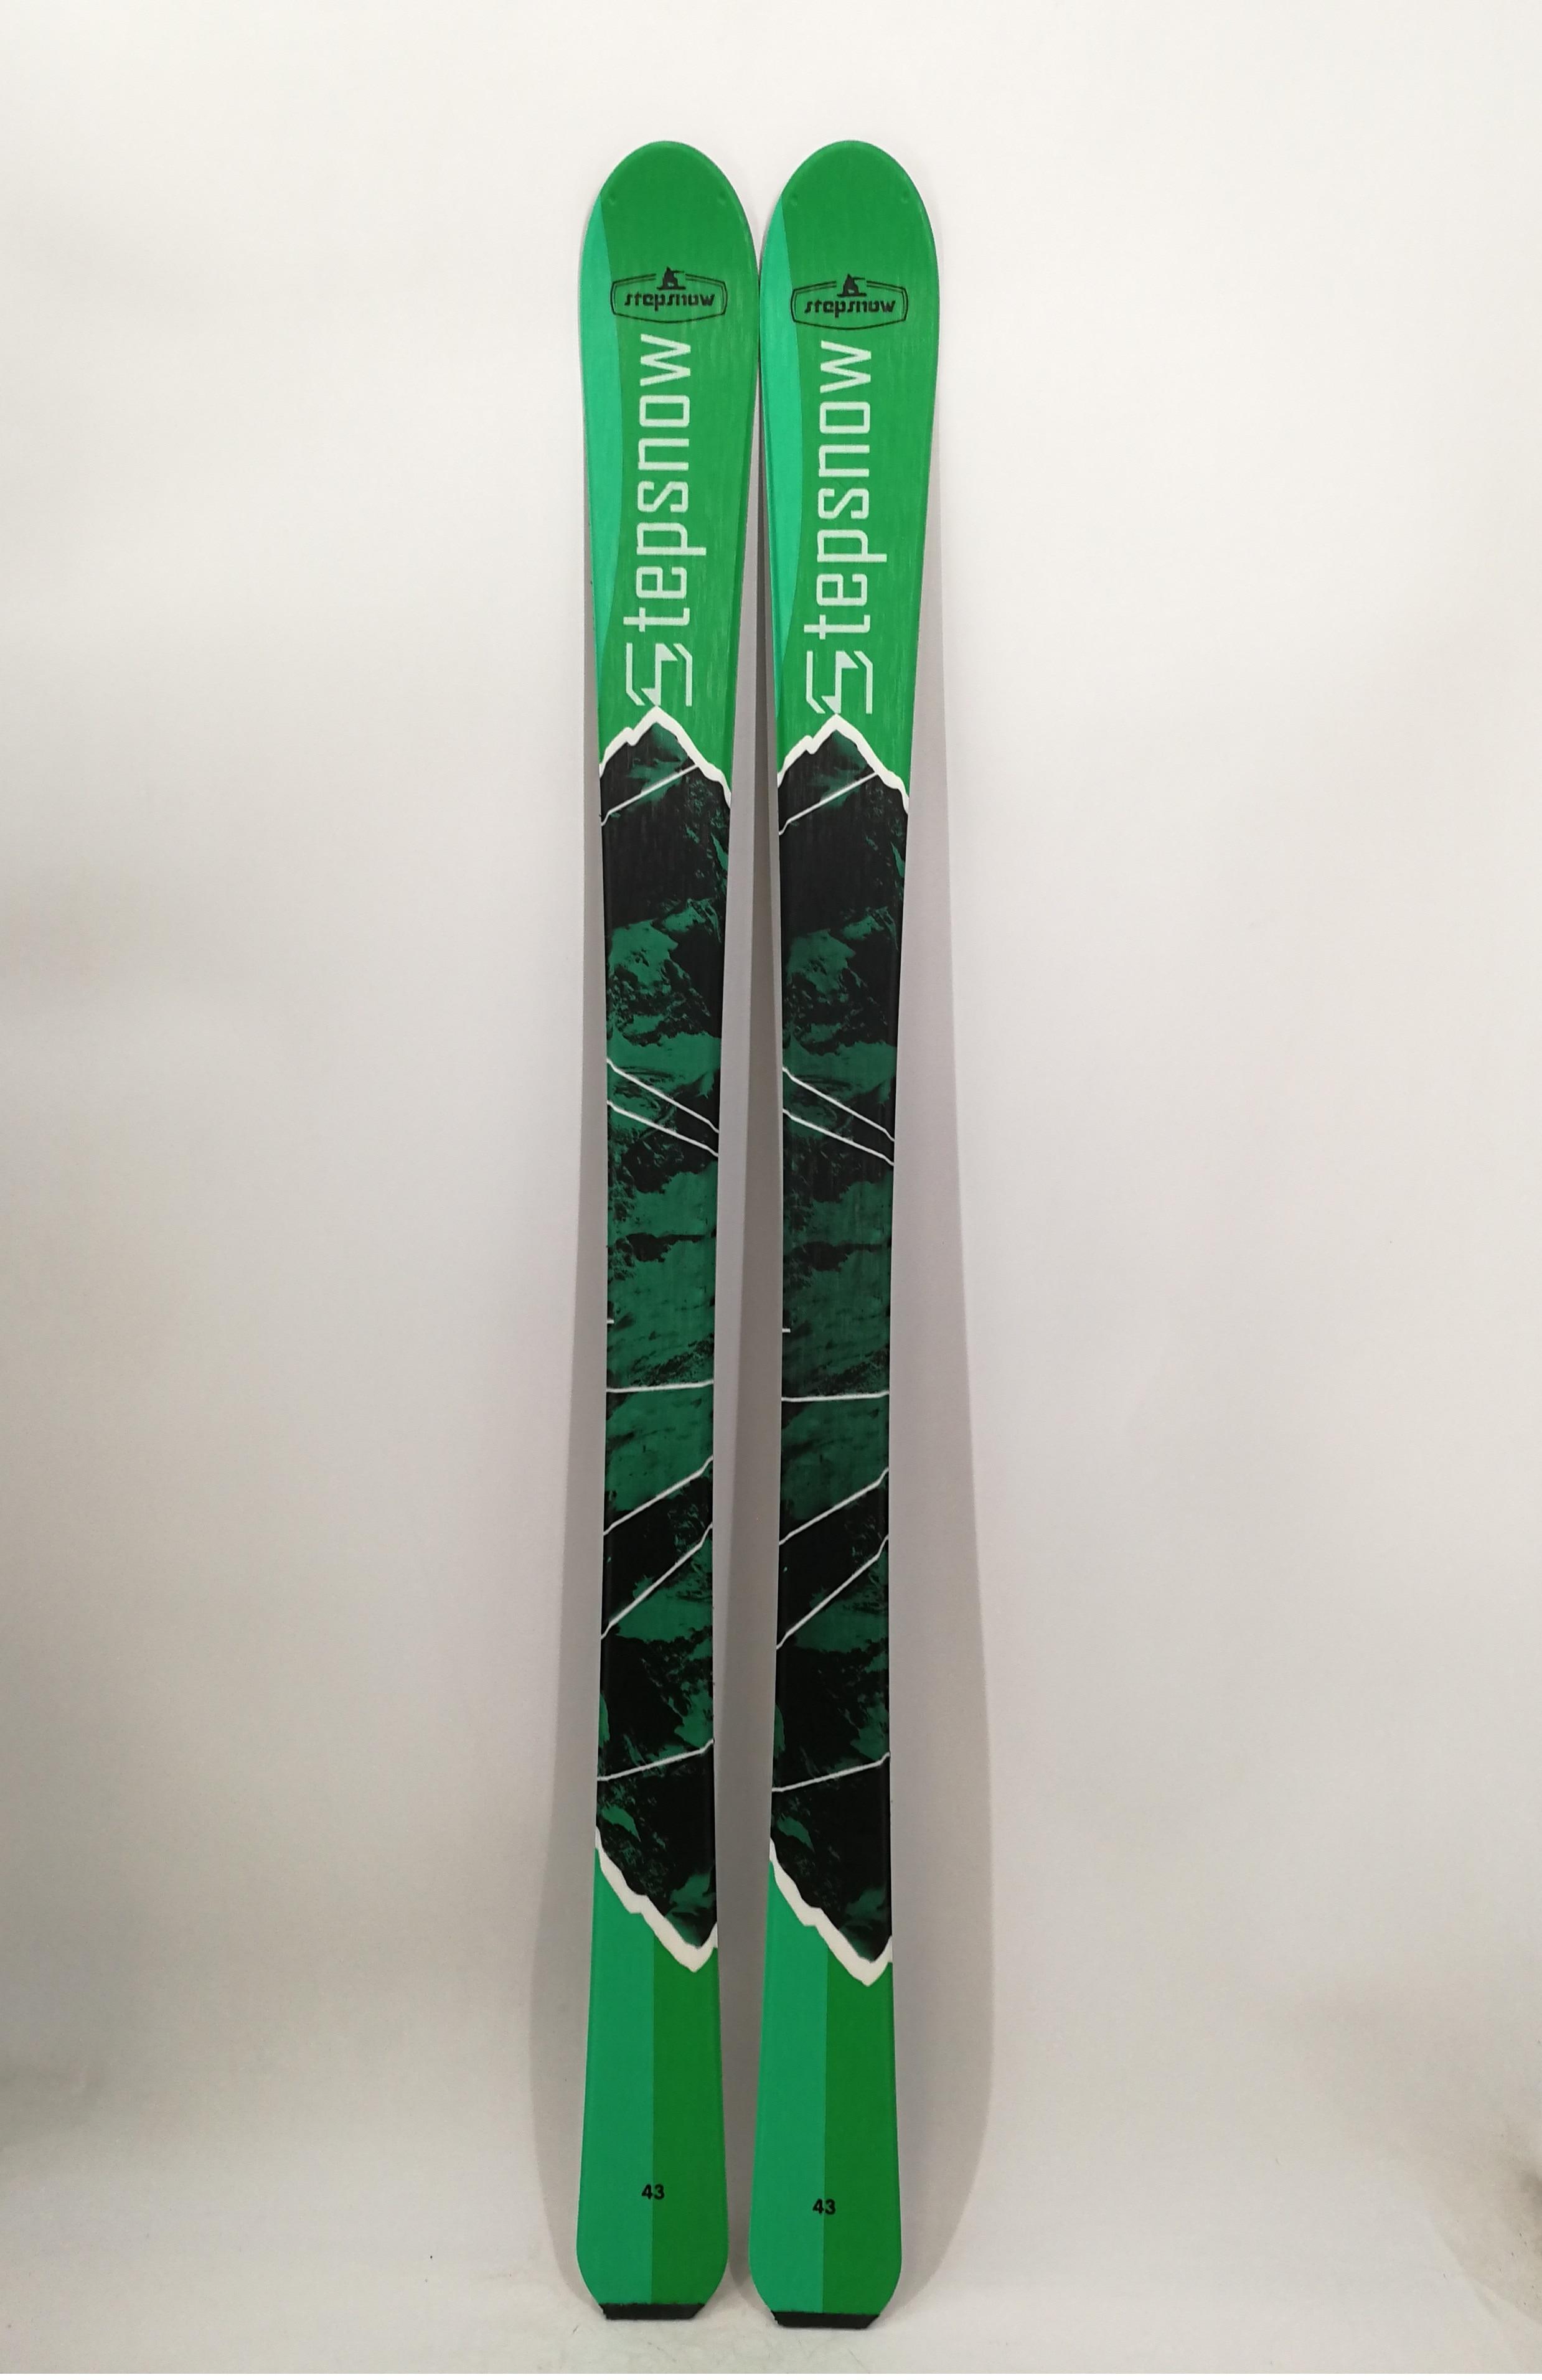 Stepsnow S-WJ133cm universal snowboard  professional single skiing board deck snowboard  board skis skiing